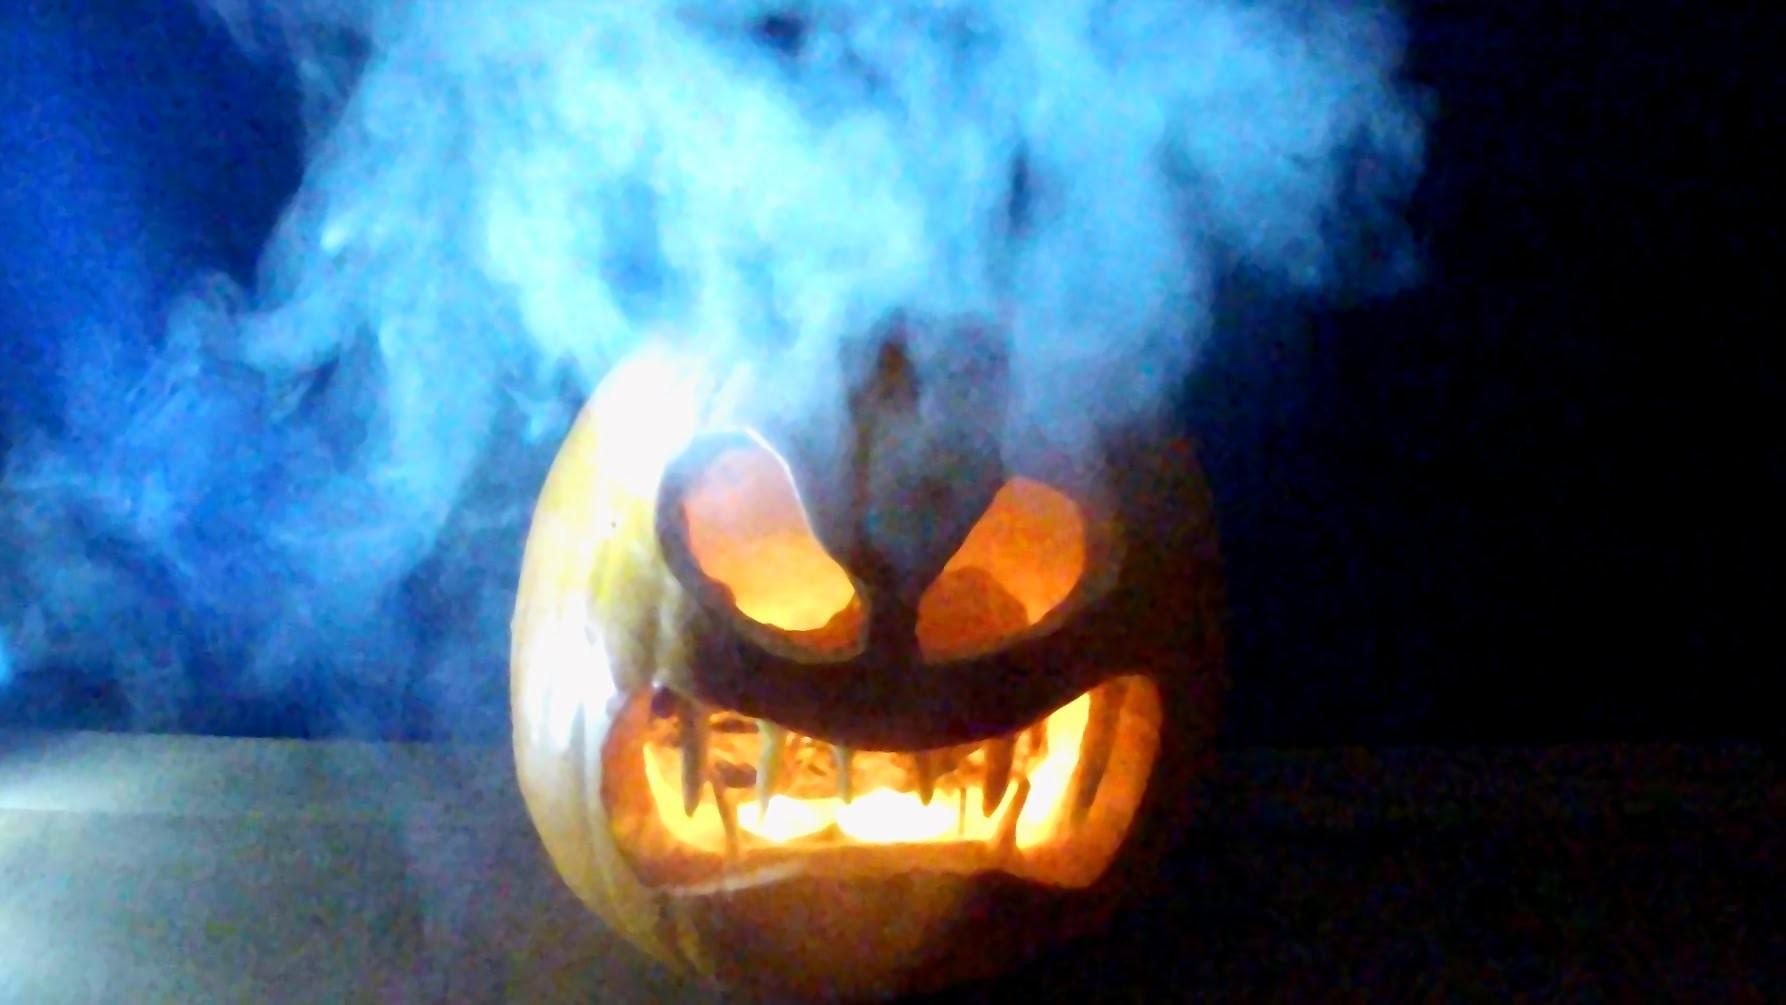 How to Make a Smoking Pumpkin - Halloween Jack o Lantern